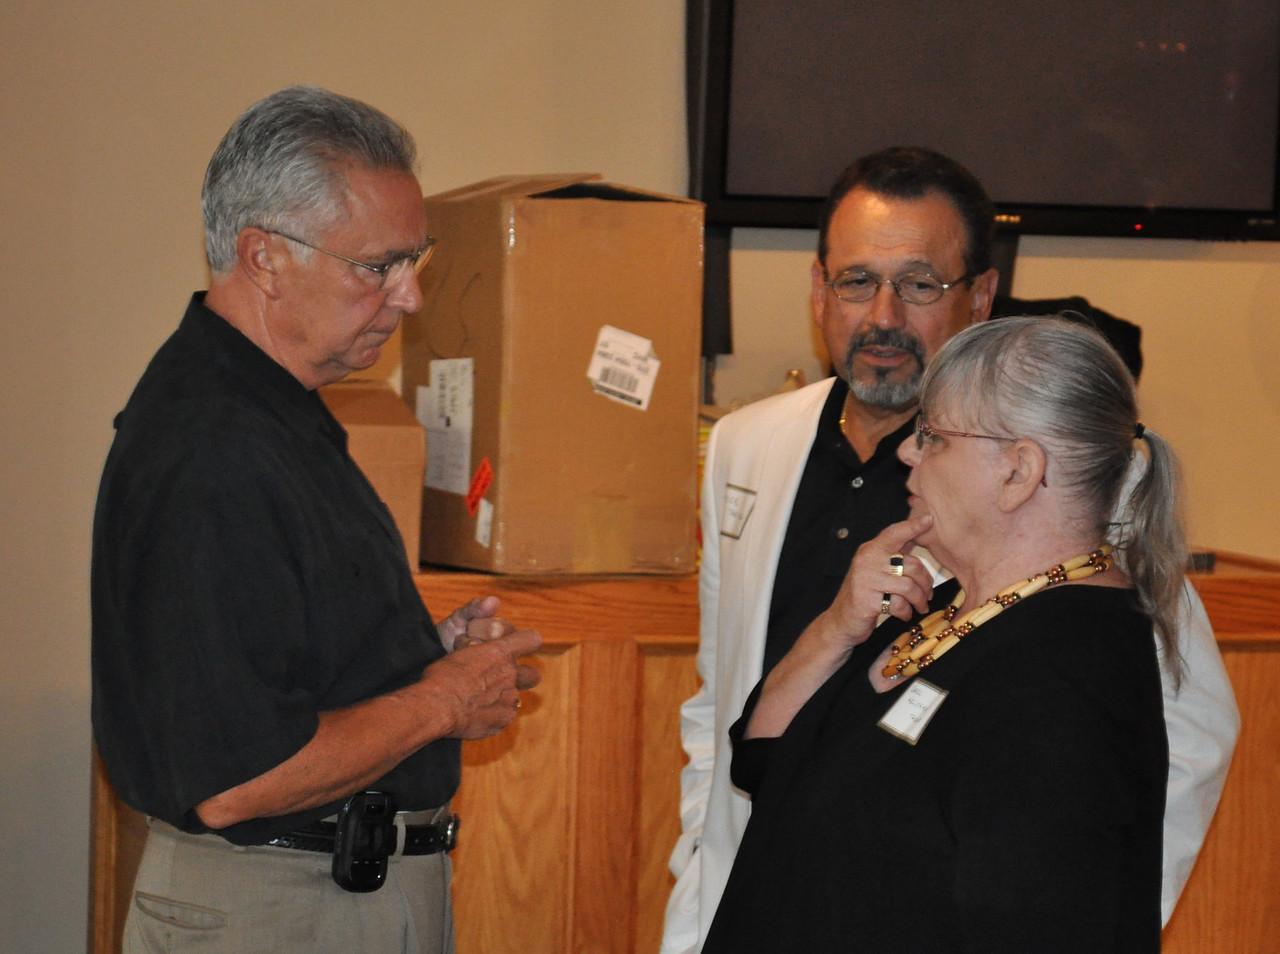 Rich Circo & Carolyn Kellerman Trevino & Mick